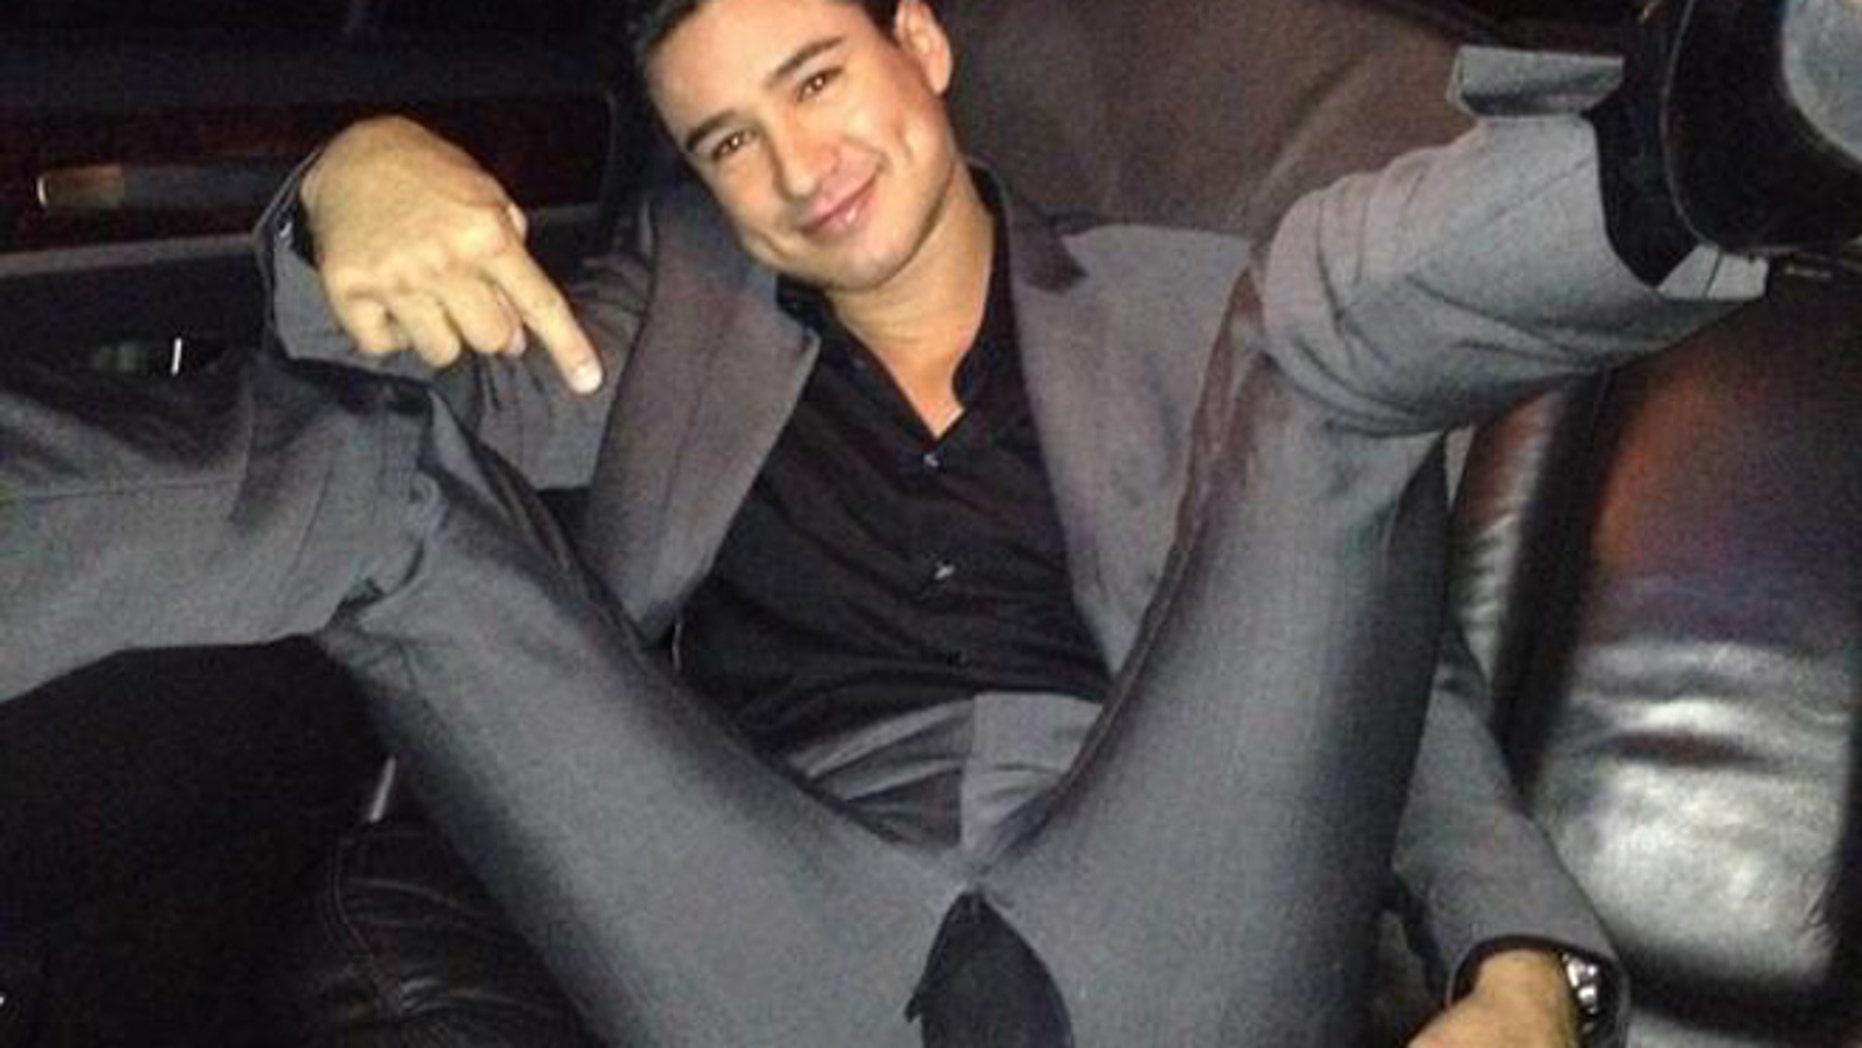 Another Wardrobe Malfunction Mario Lopez Rips Pants During Vegas